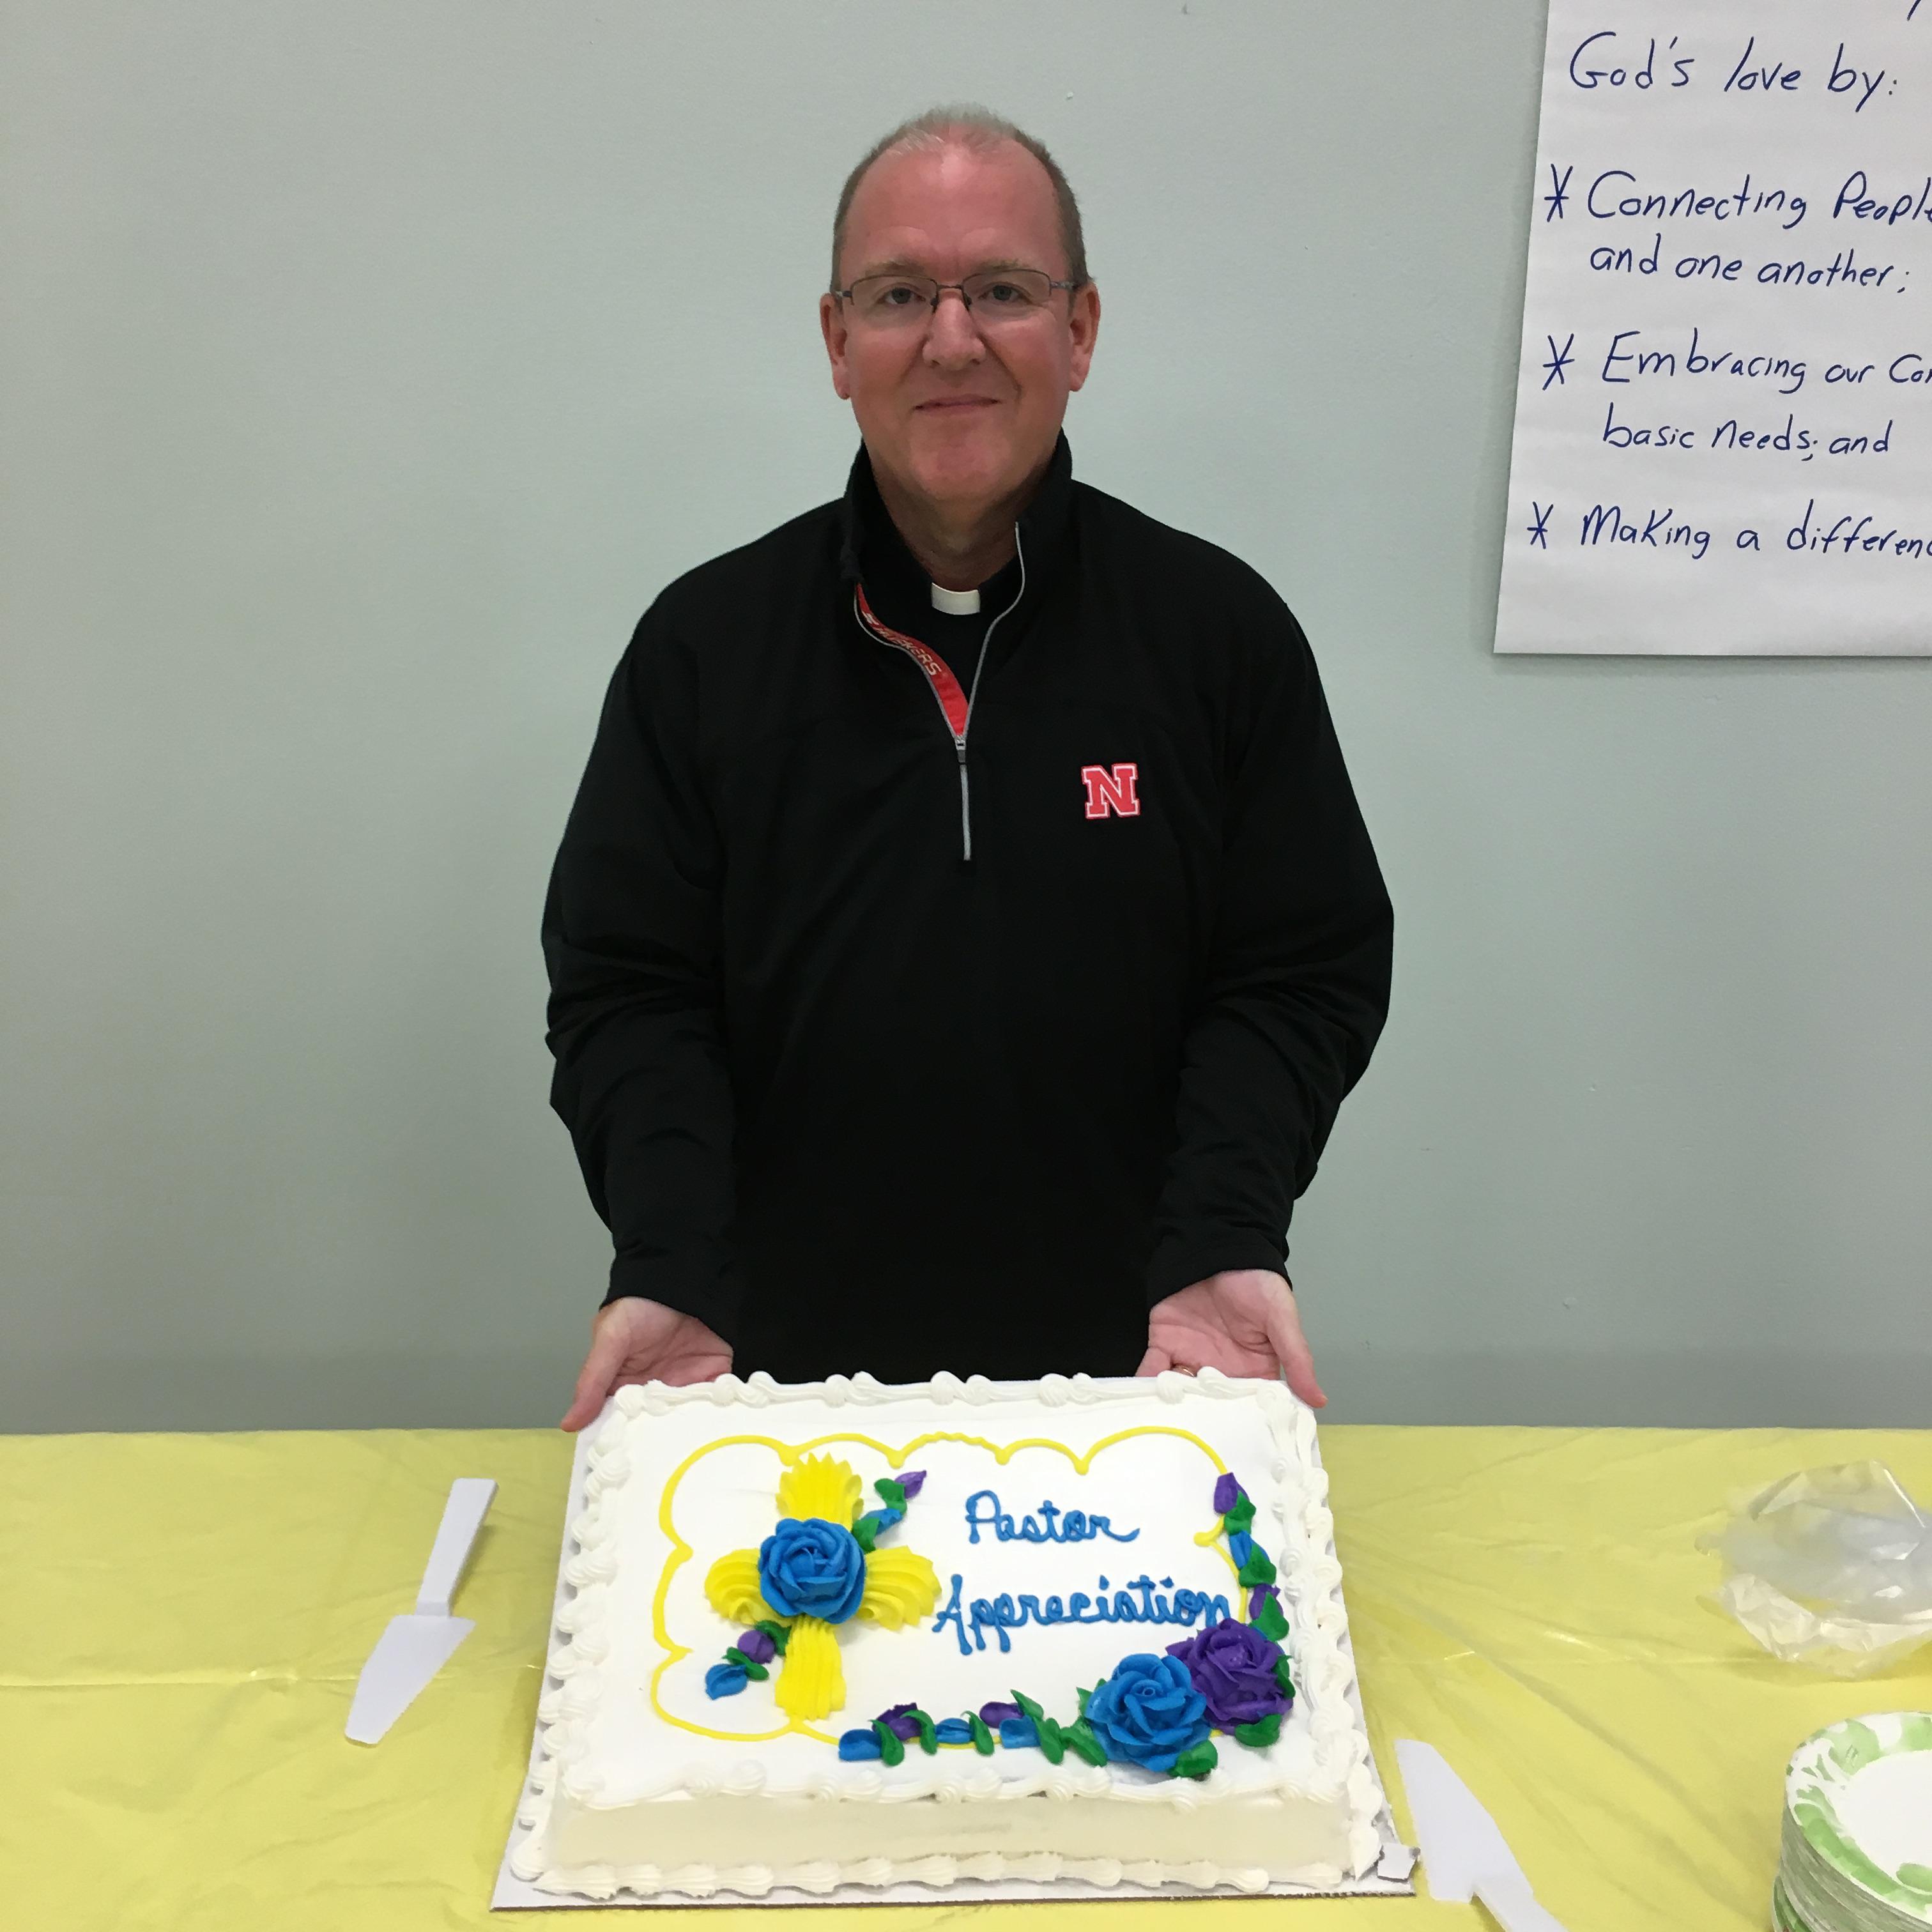 pastor-appreciation-me-cake